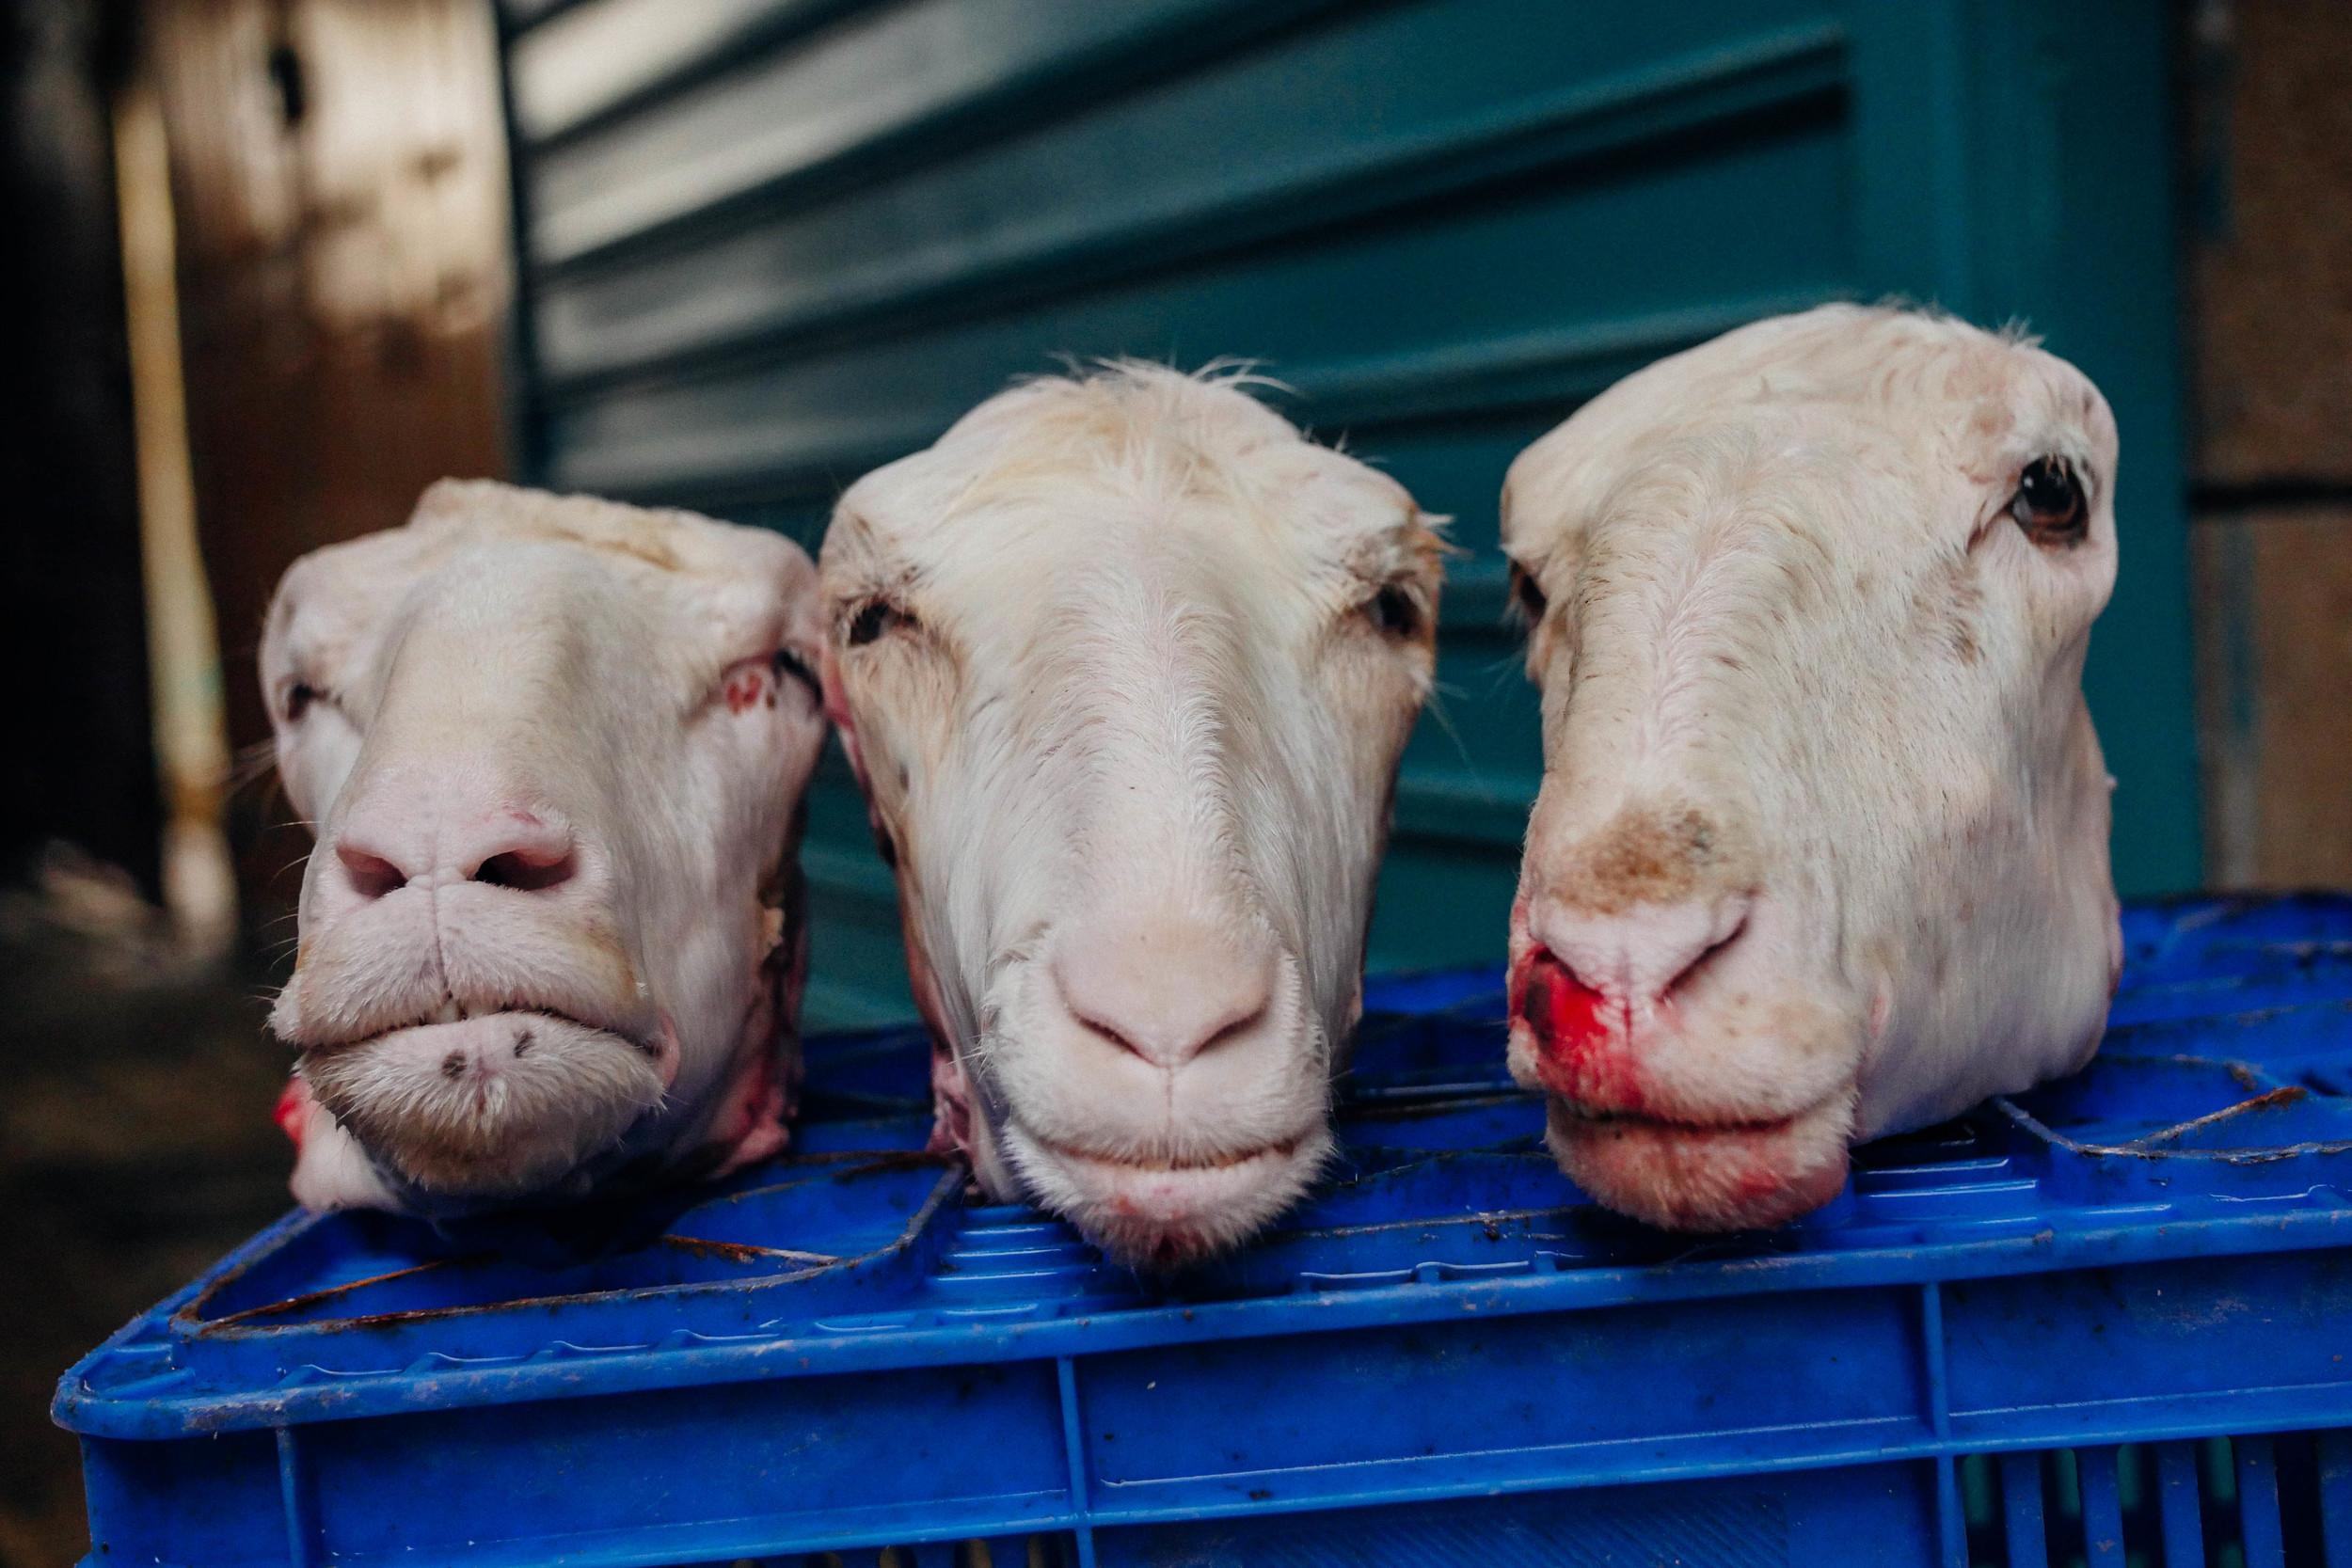 Goat heads: the local butcher in Akko